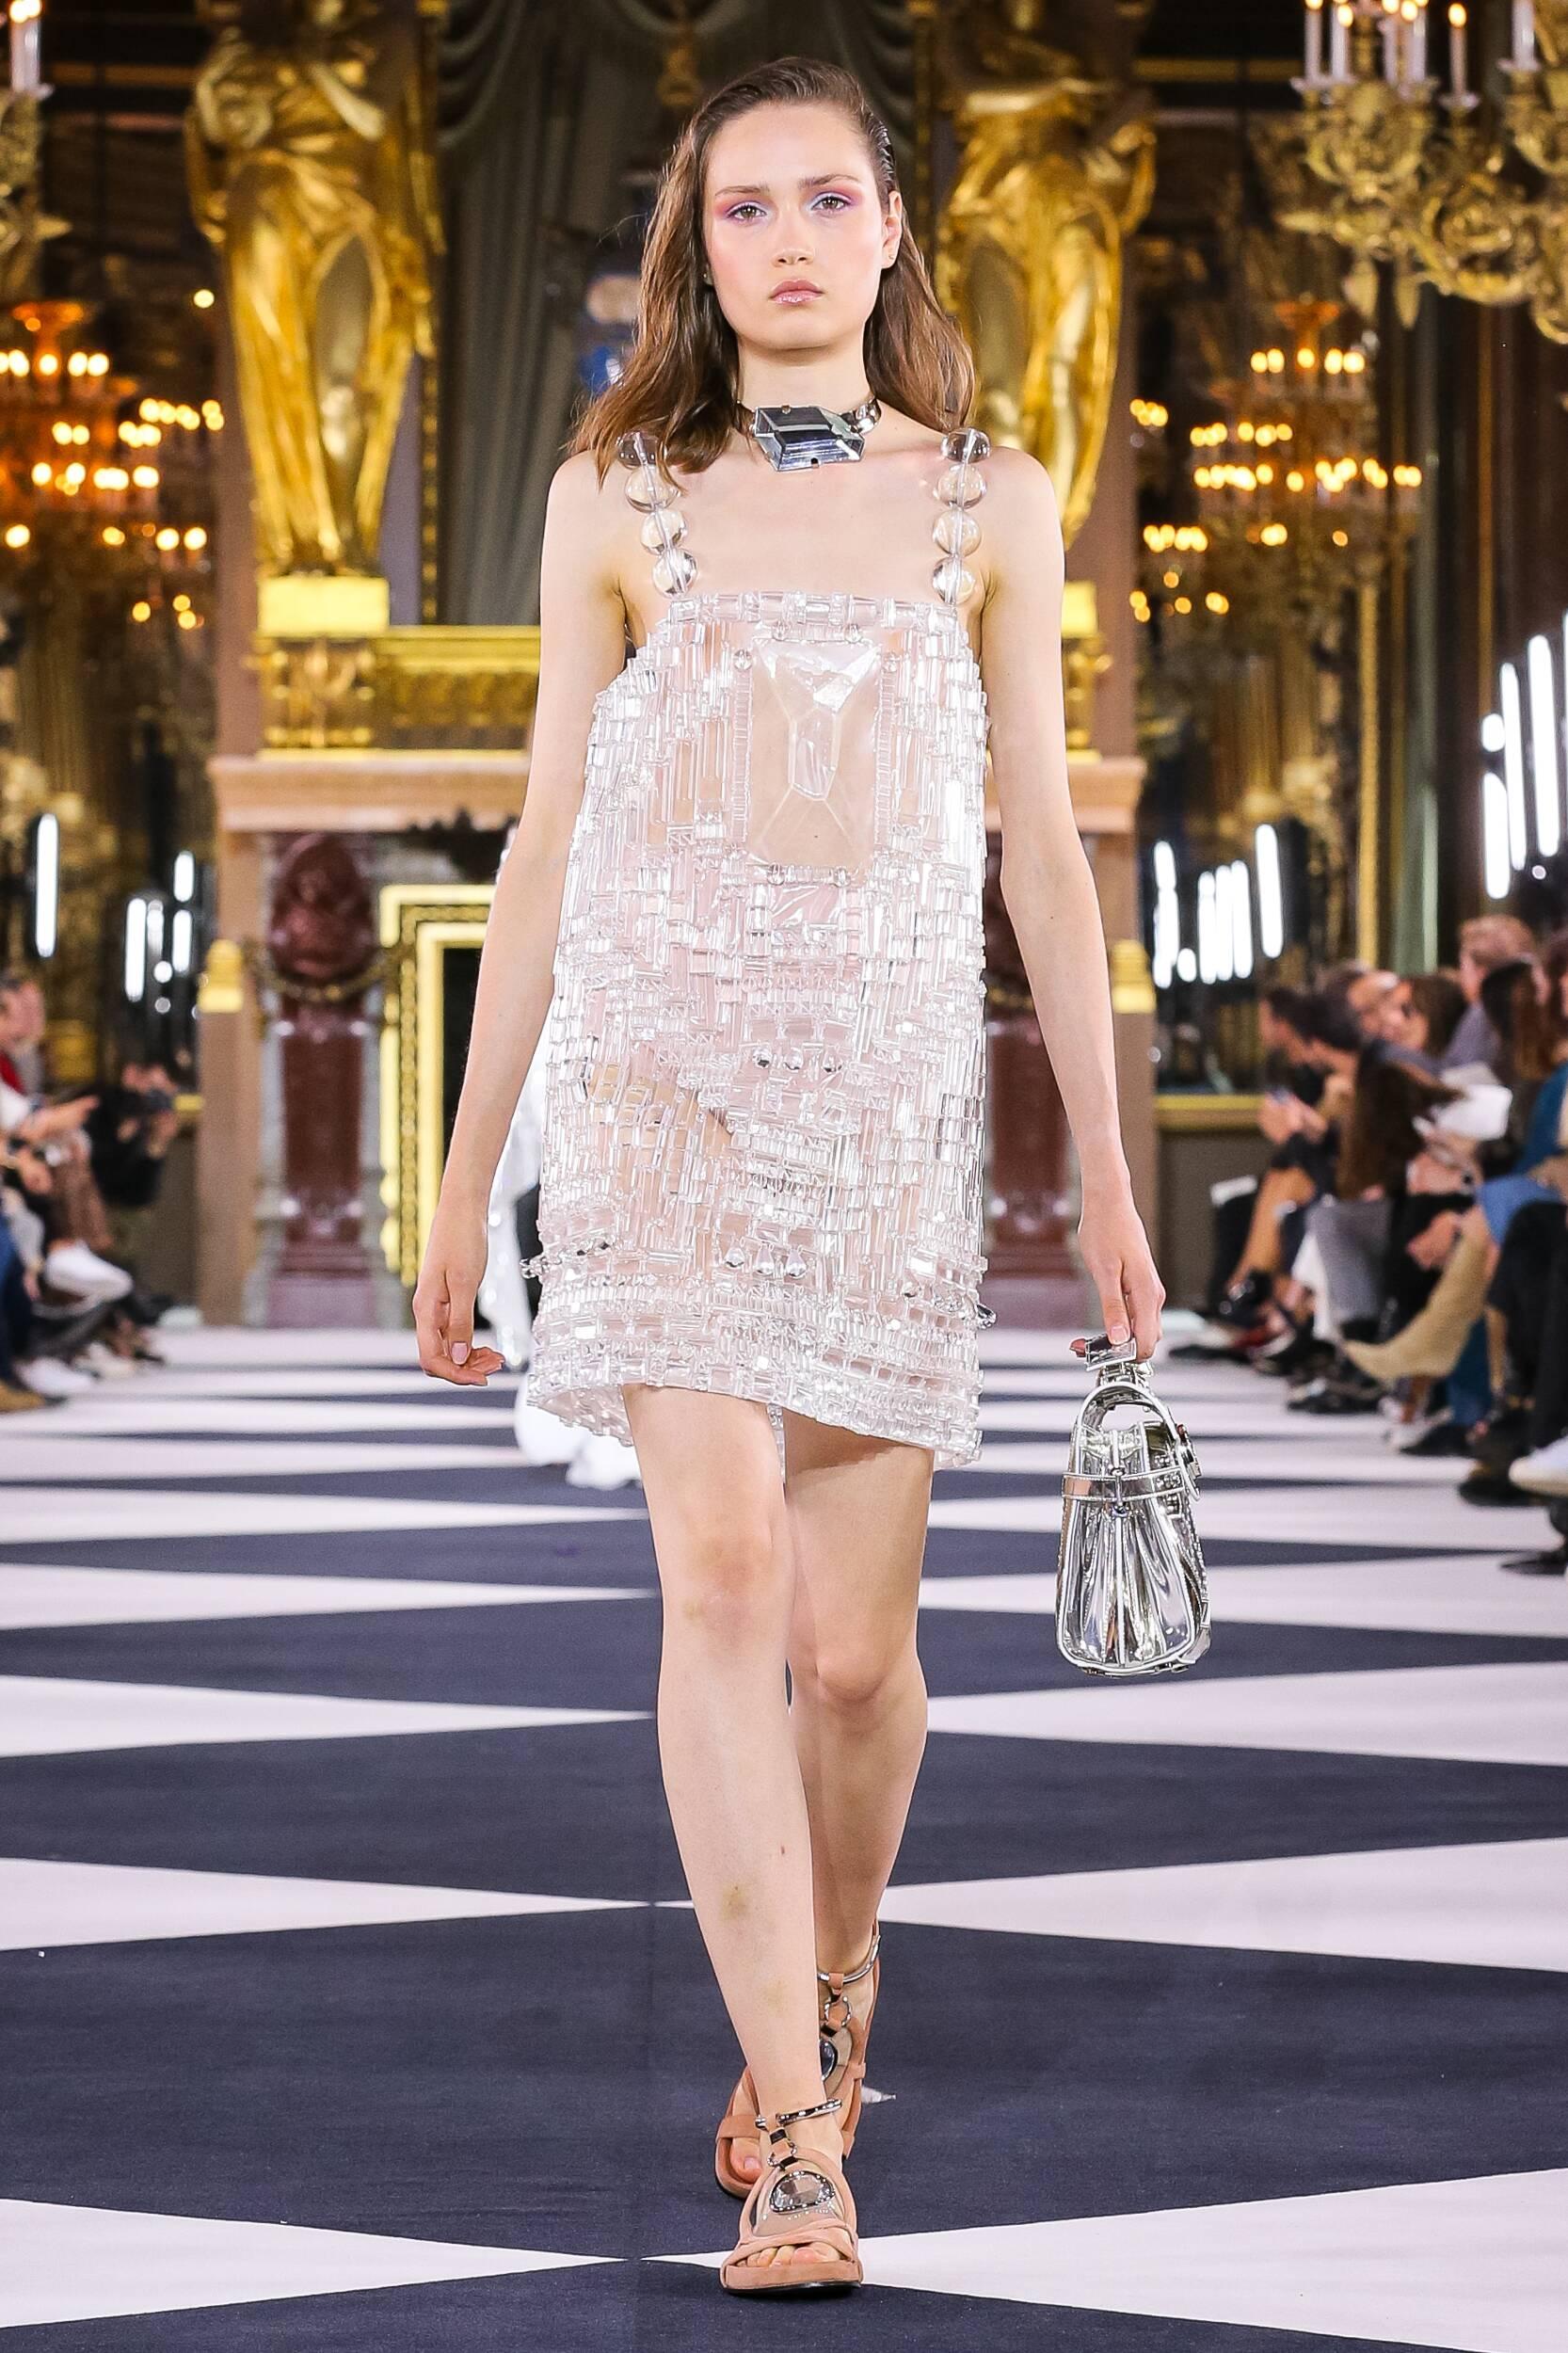 Woman SS 2020 Balmain Show Paris Fashion